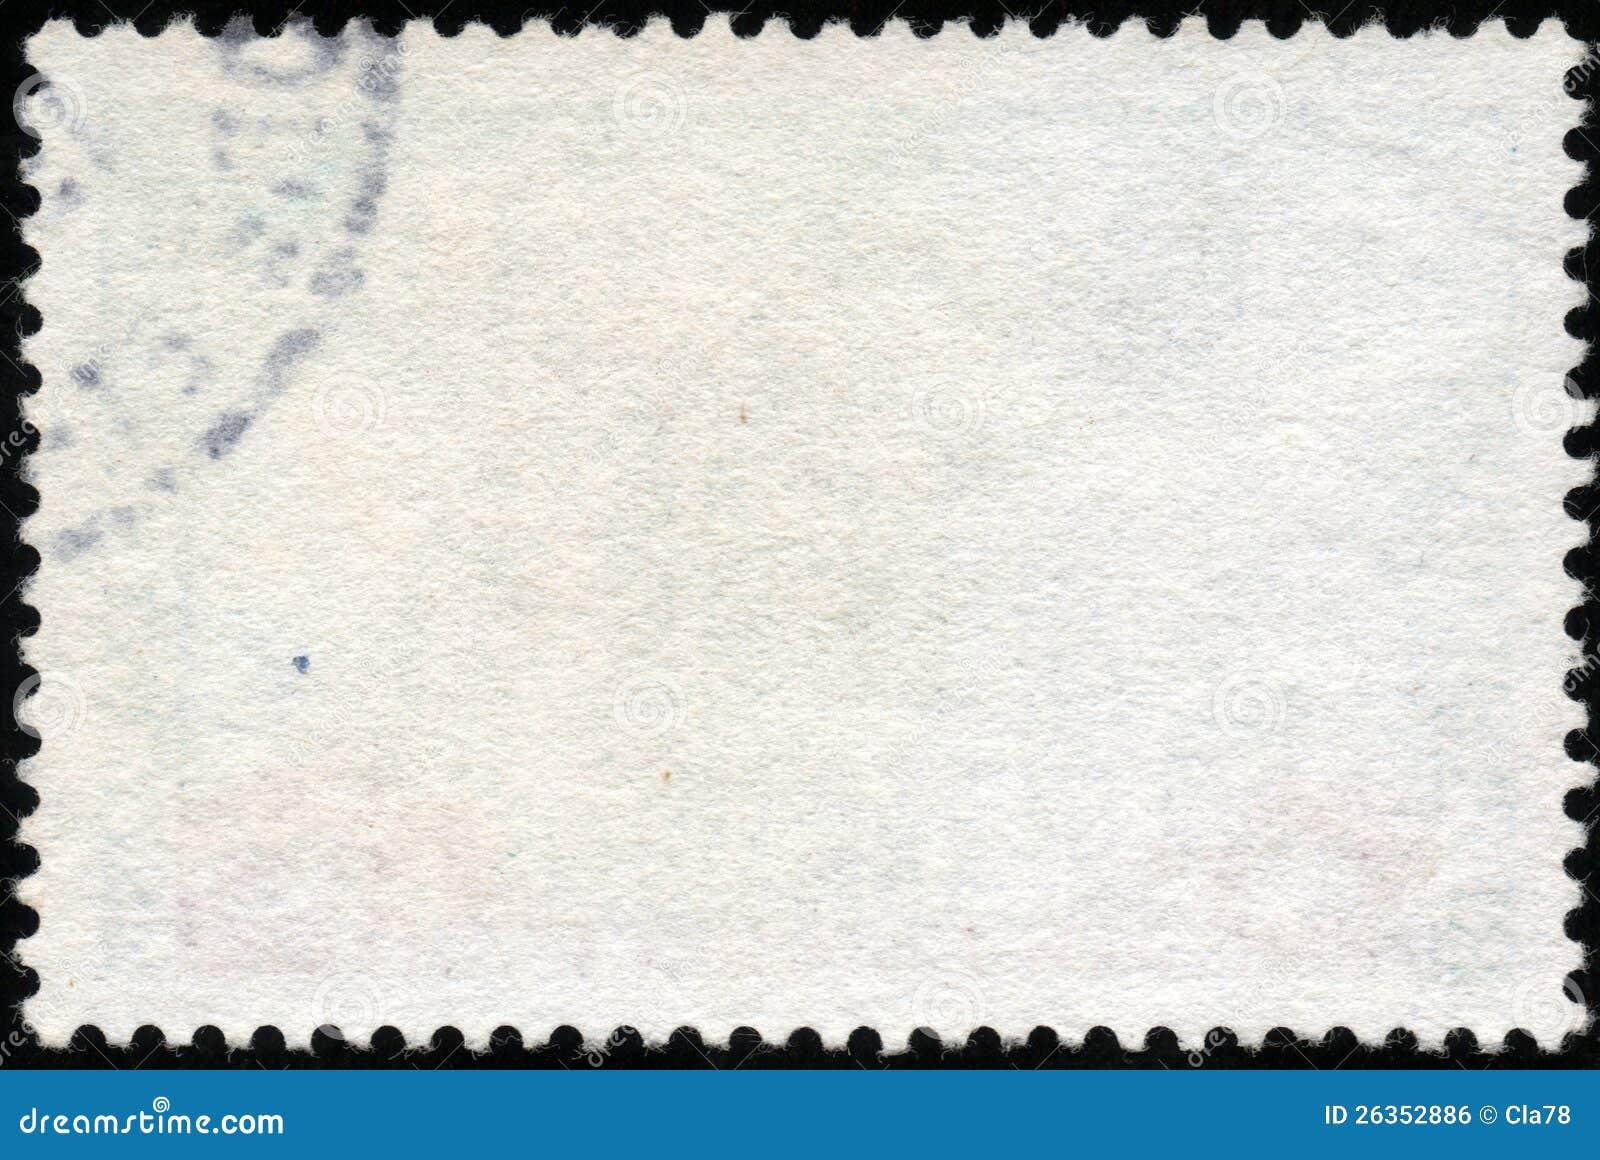 Weißer horizontaler Stempel